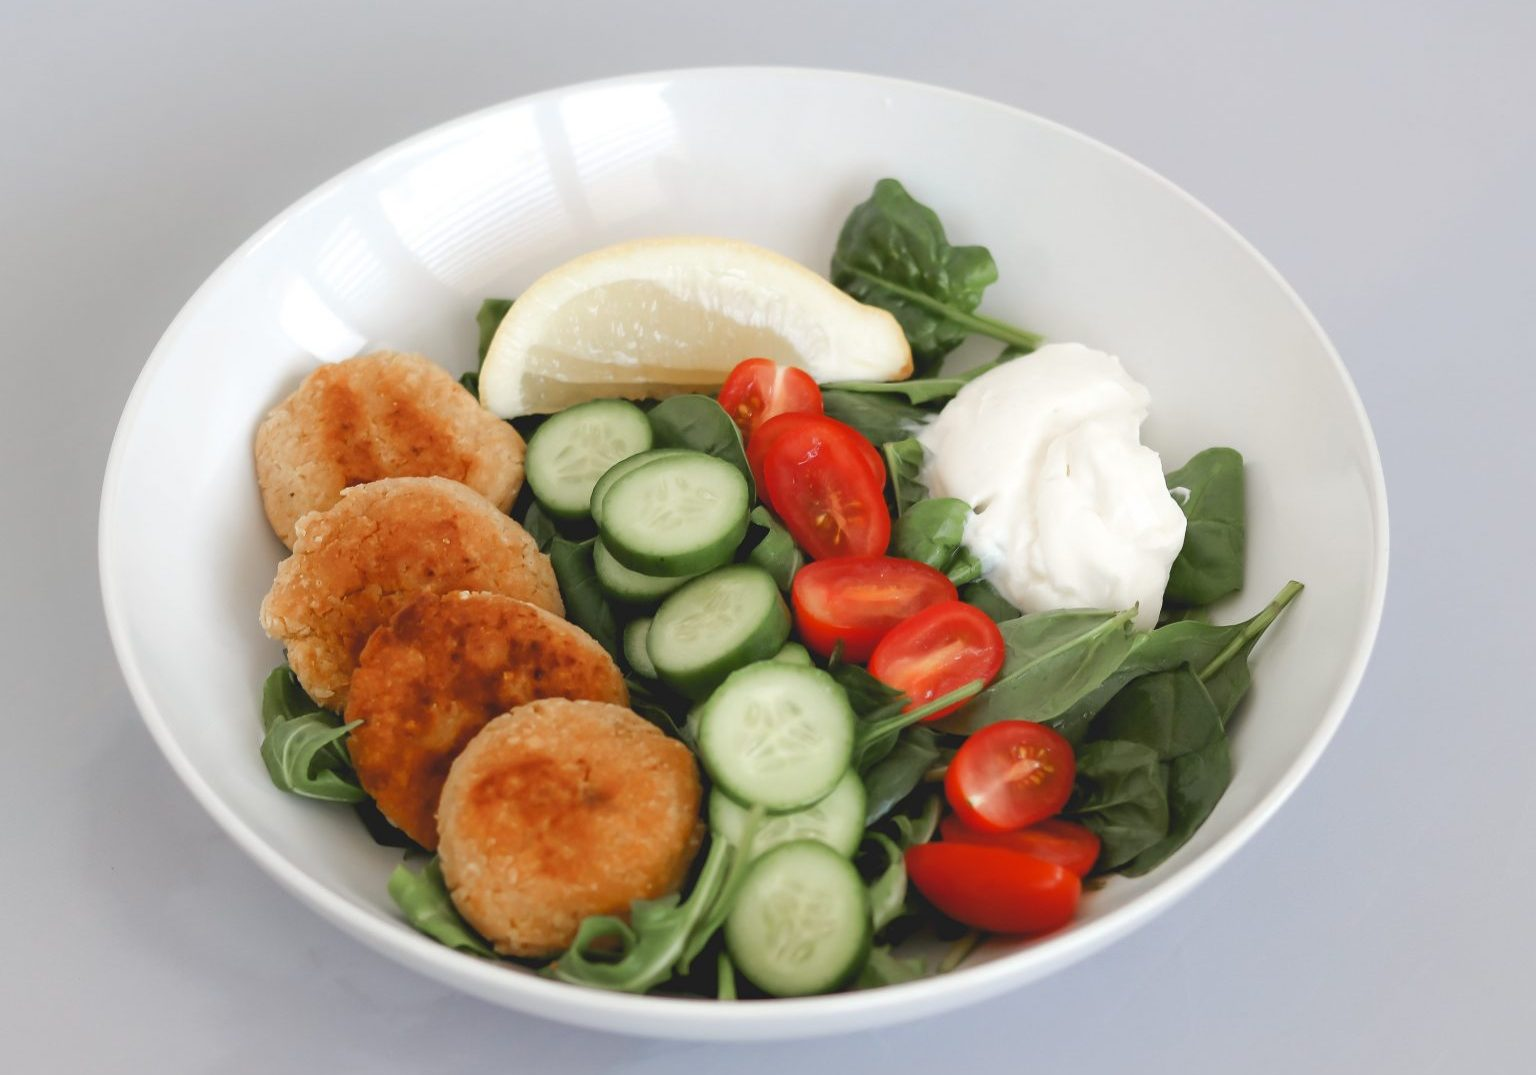 Chickpea patty salad